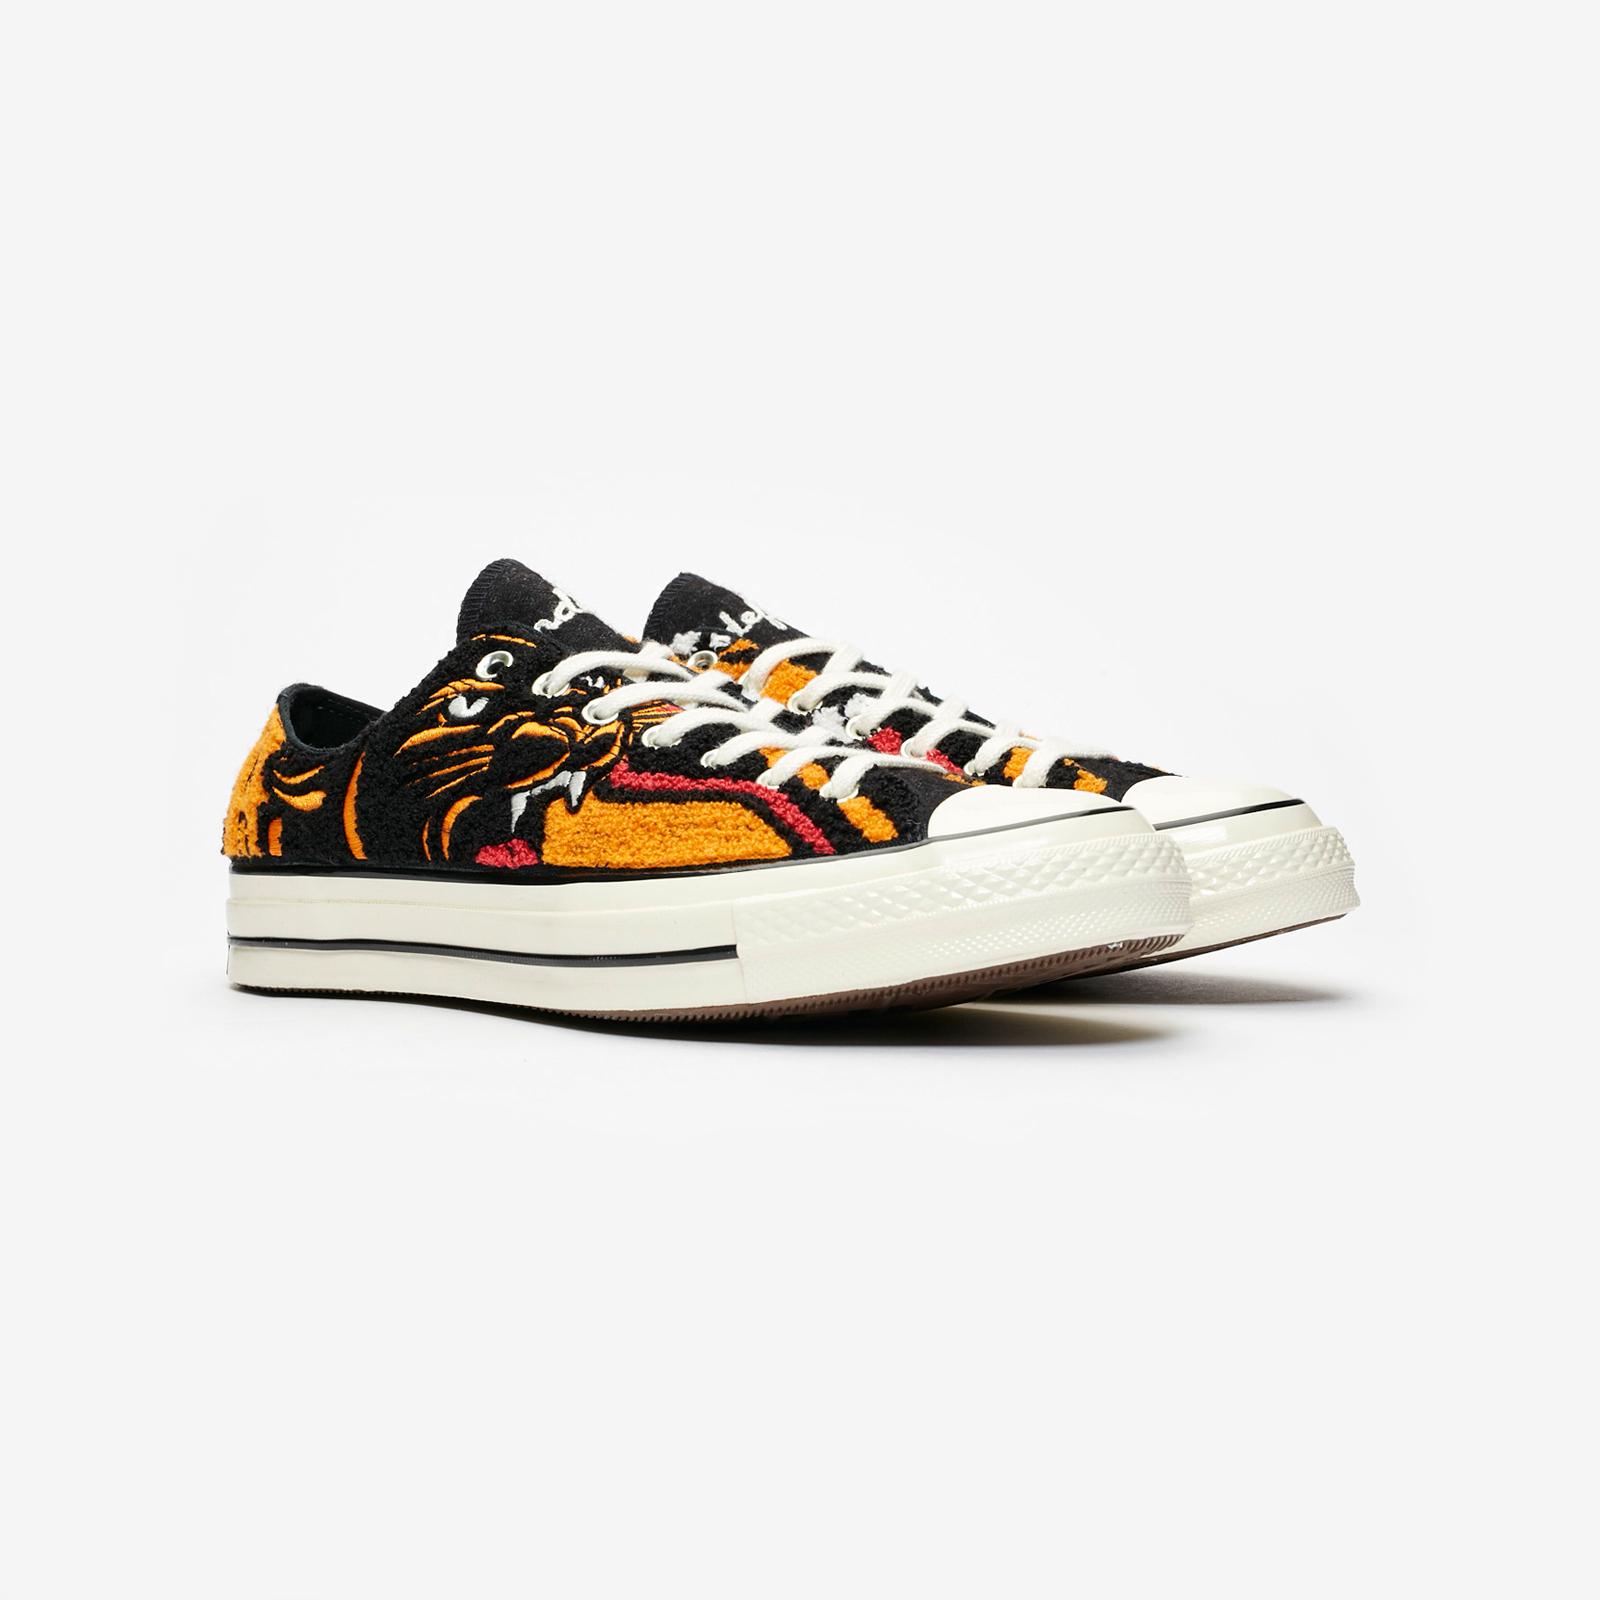 Converse Chuck Ox 70 x UNDFTD - 162981c - Sneakersnstuff  06efaf29e